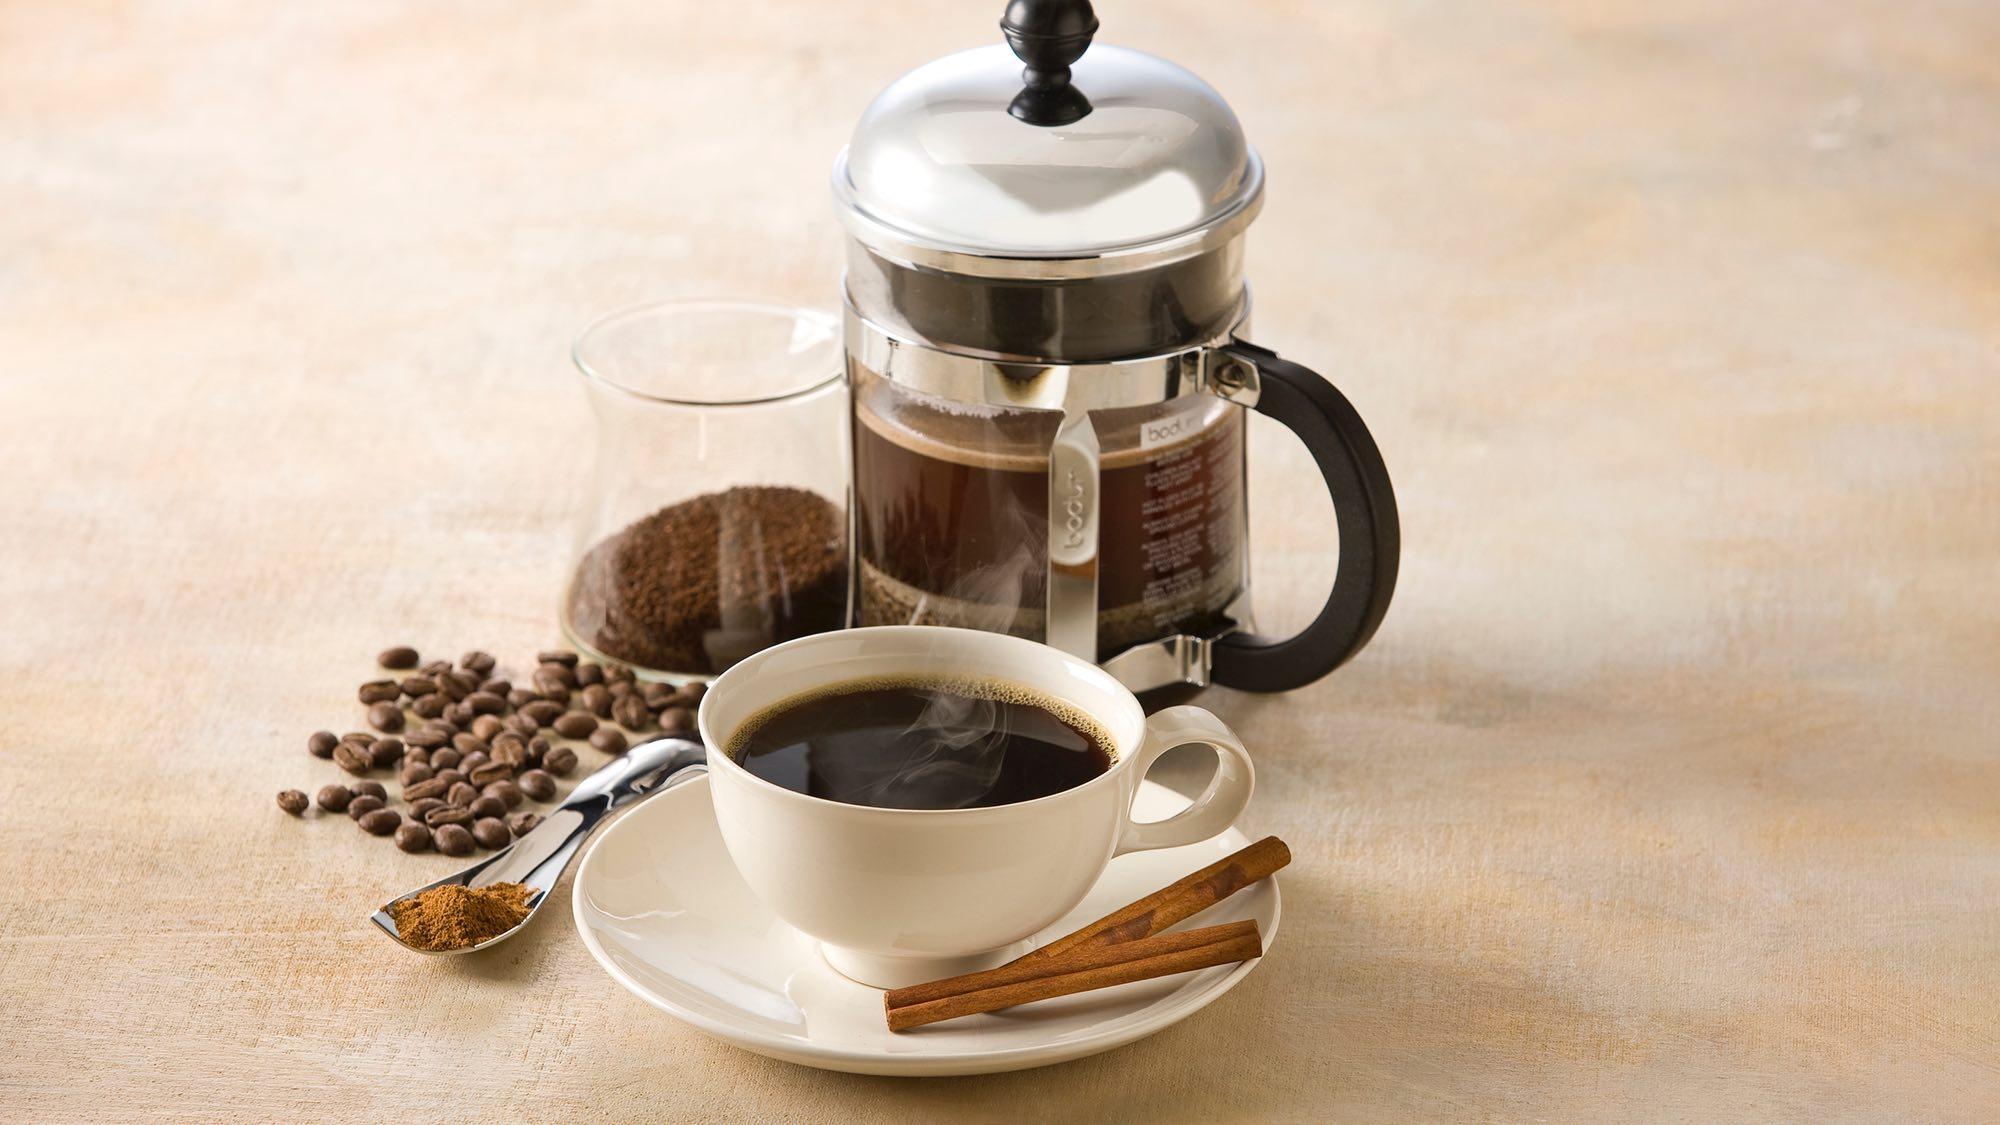 McCormick Cinnamon Spiced Coffee